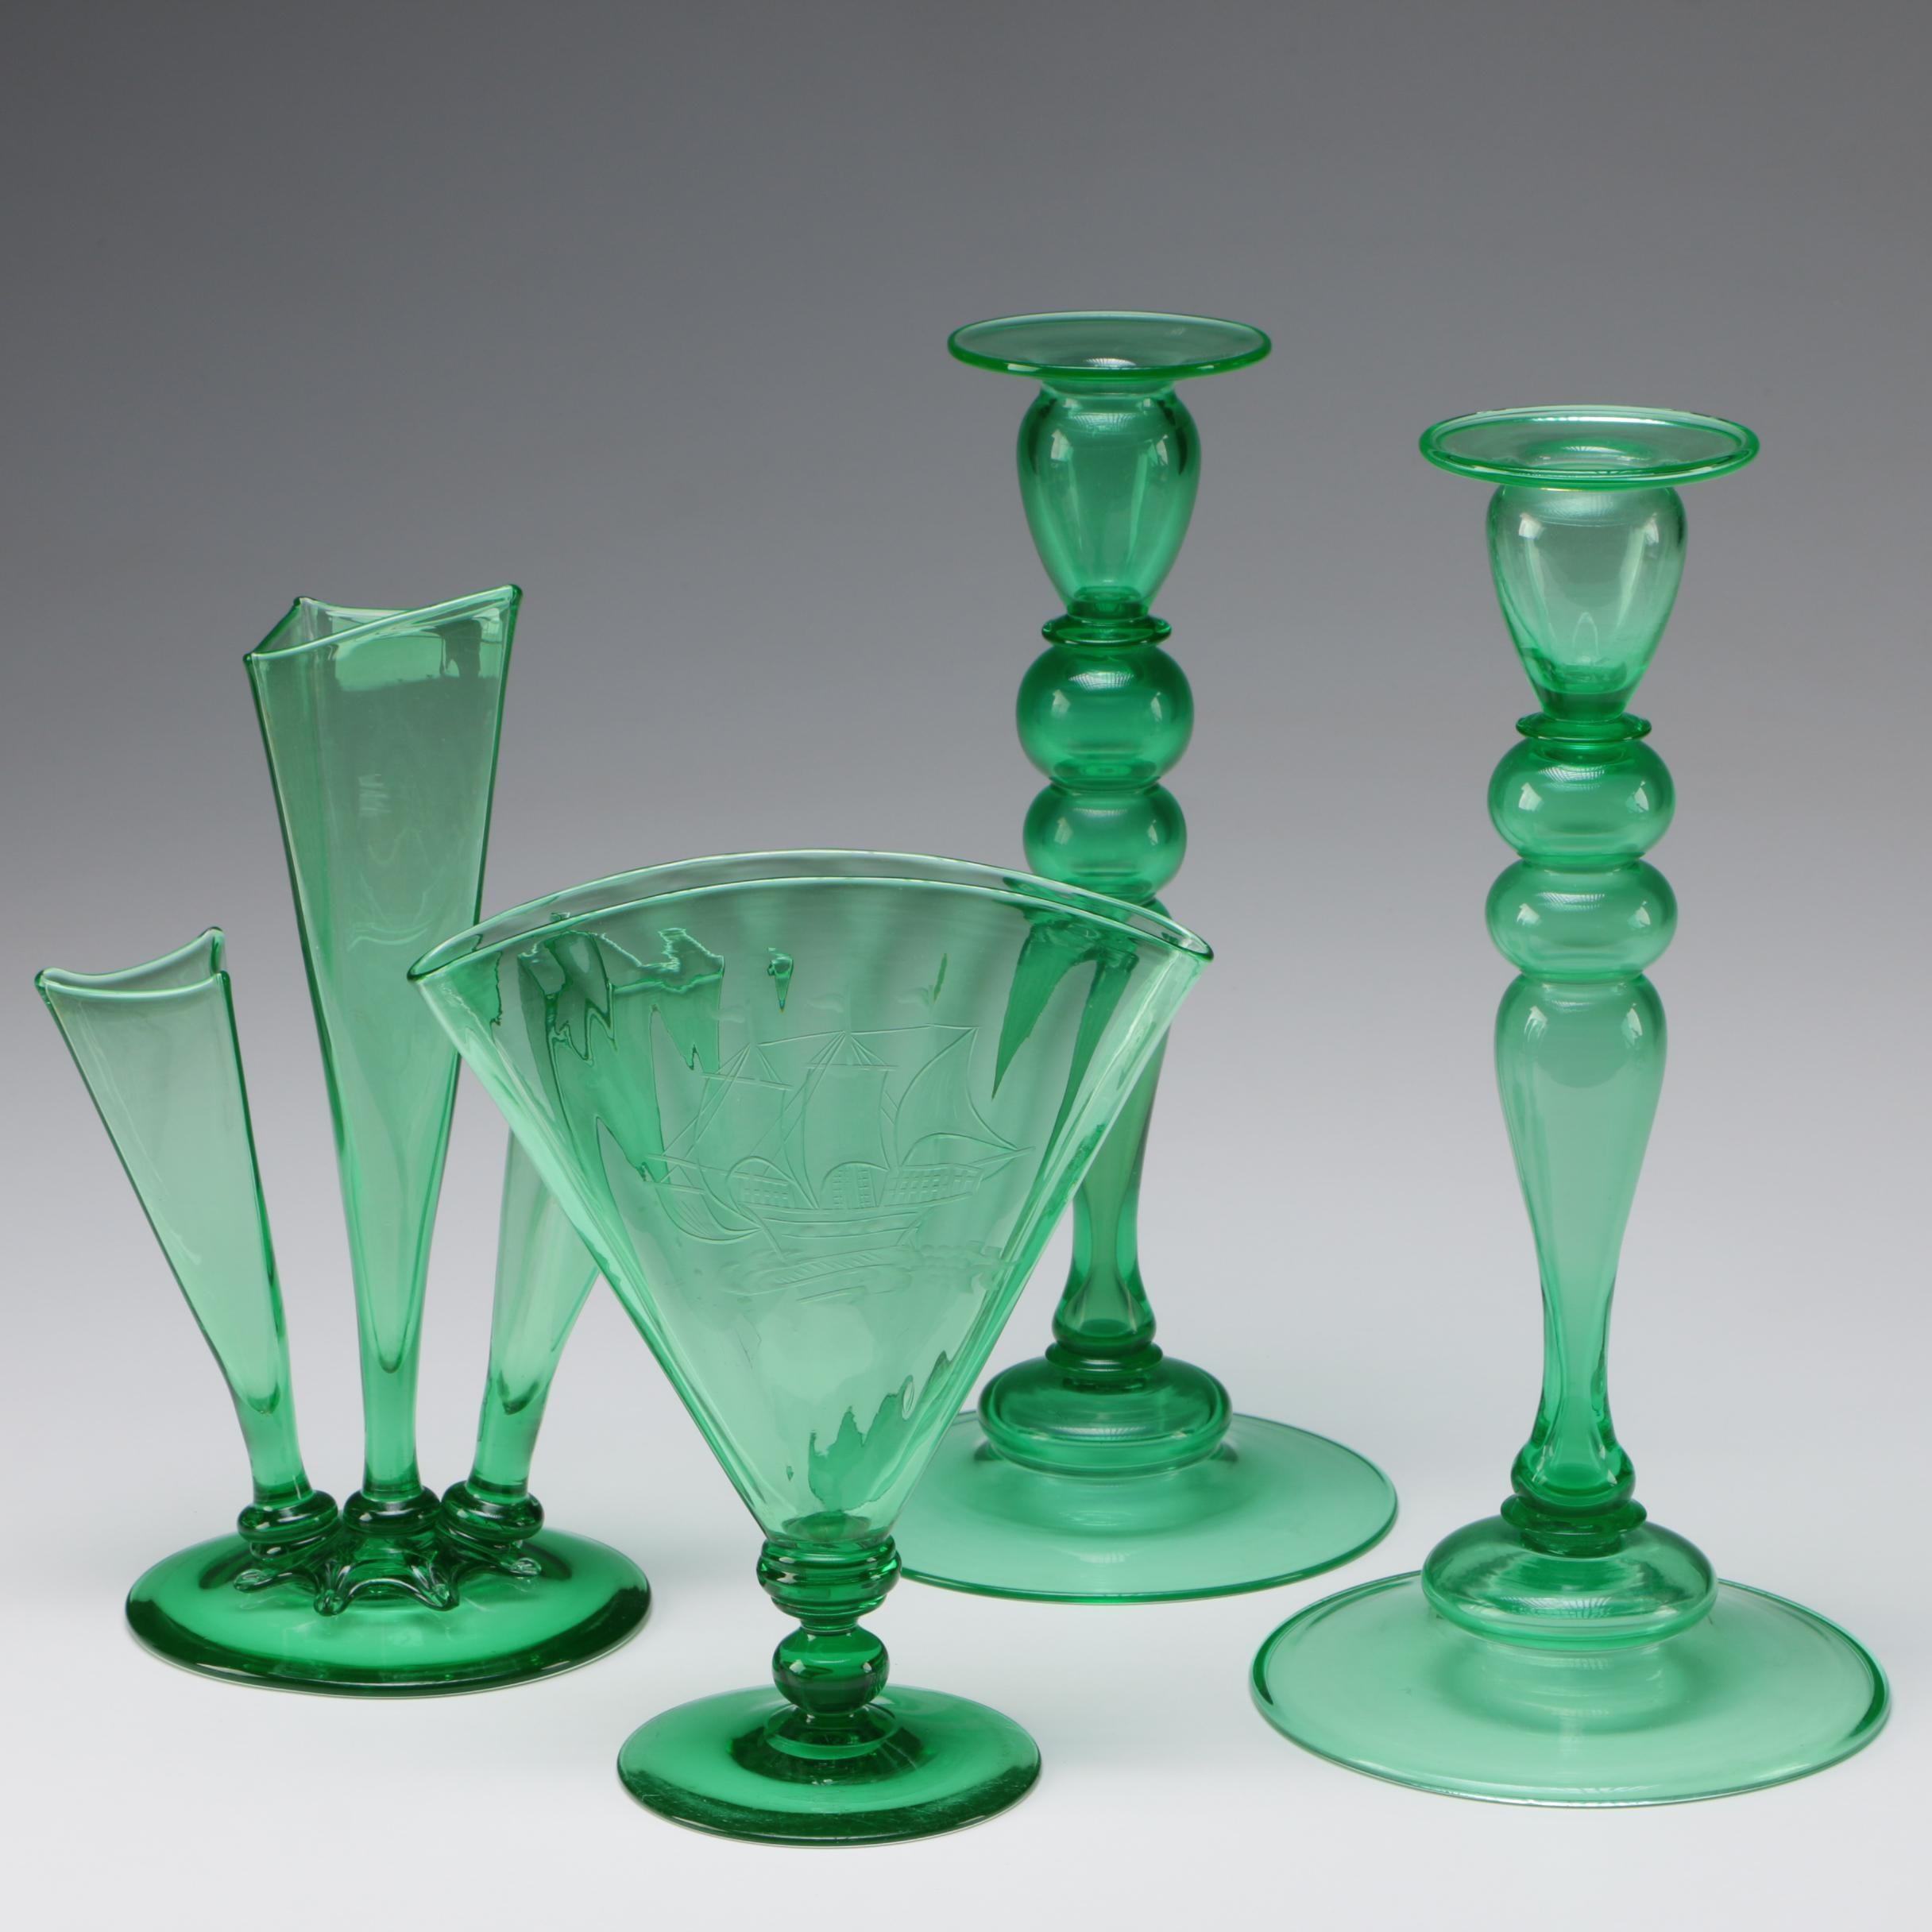 Steuben Pomona Green Art Glass Candlesticks and Vases, 1903 - 1933